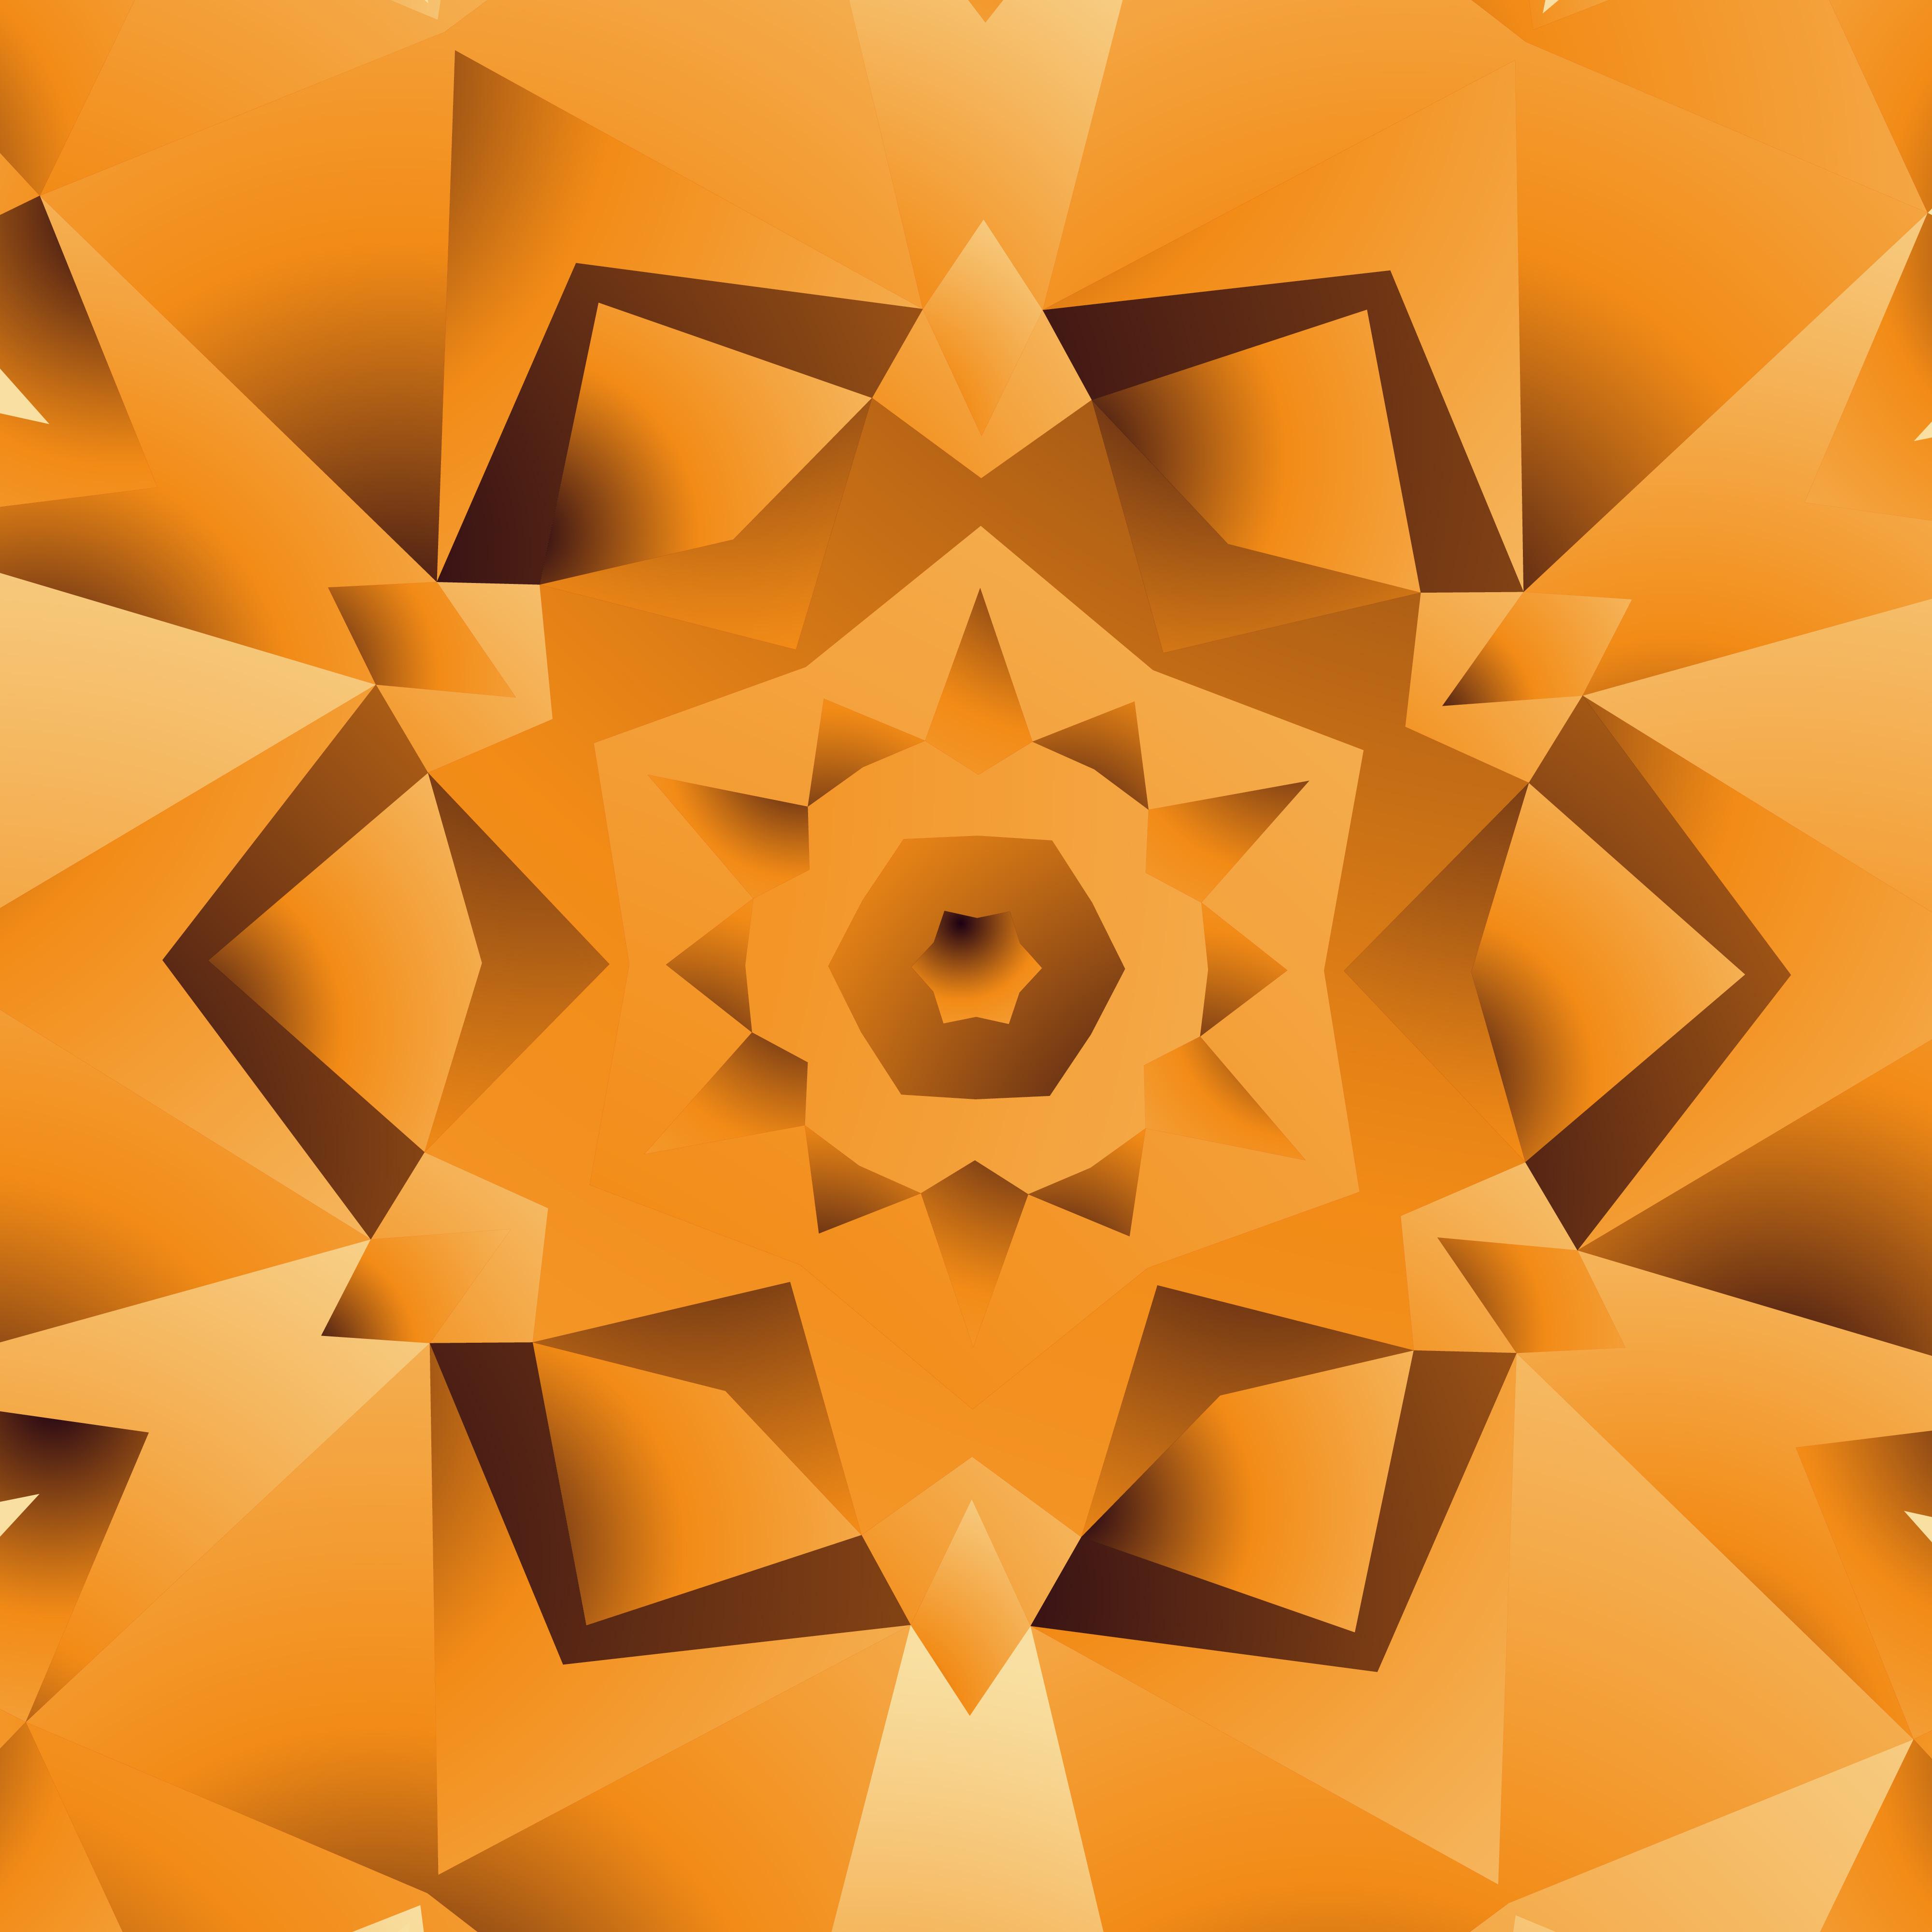 Abstract Orange Yellow Background Design Illustration